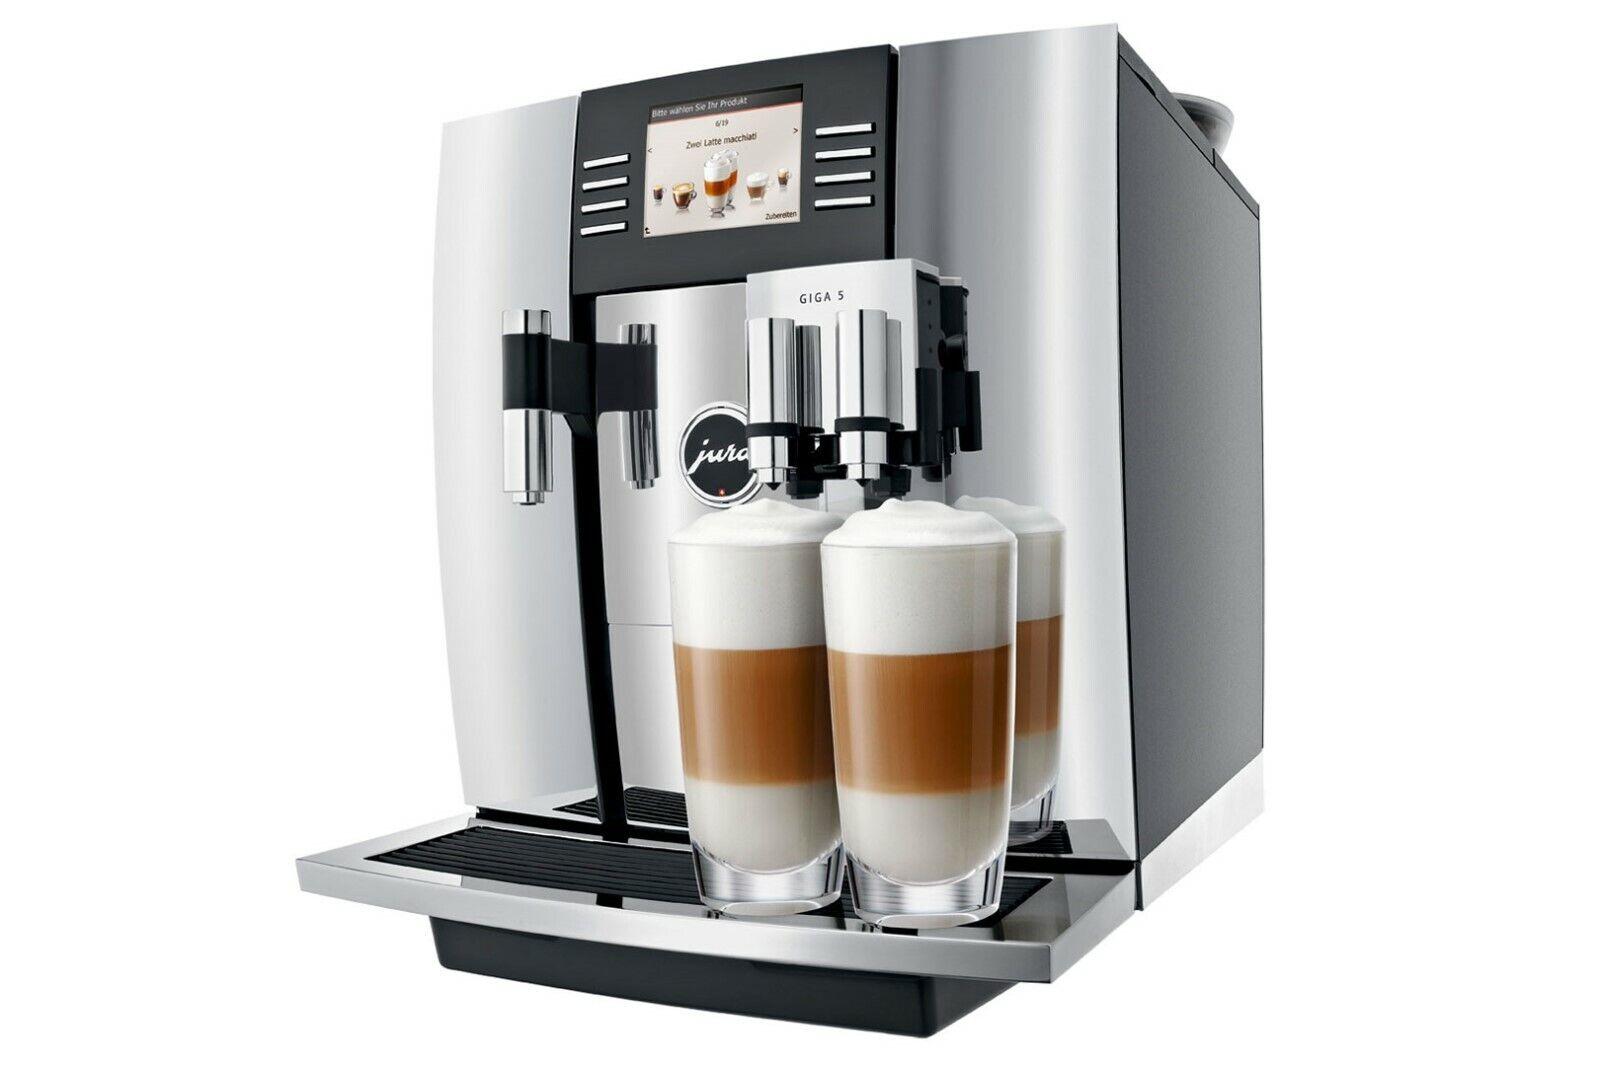 Jura GIGA 5 11 Cups Espresso Machine - Chrome, free shipping